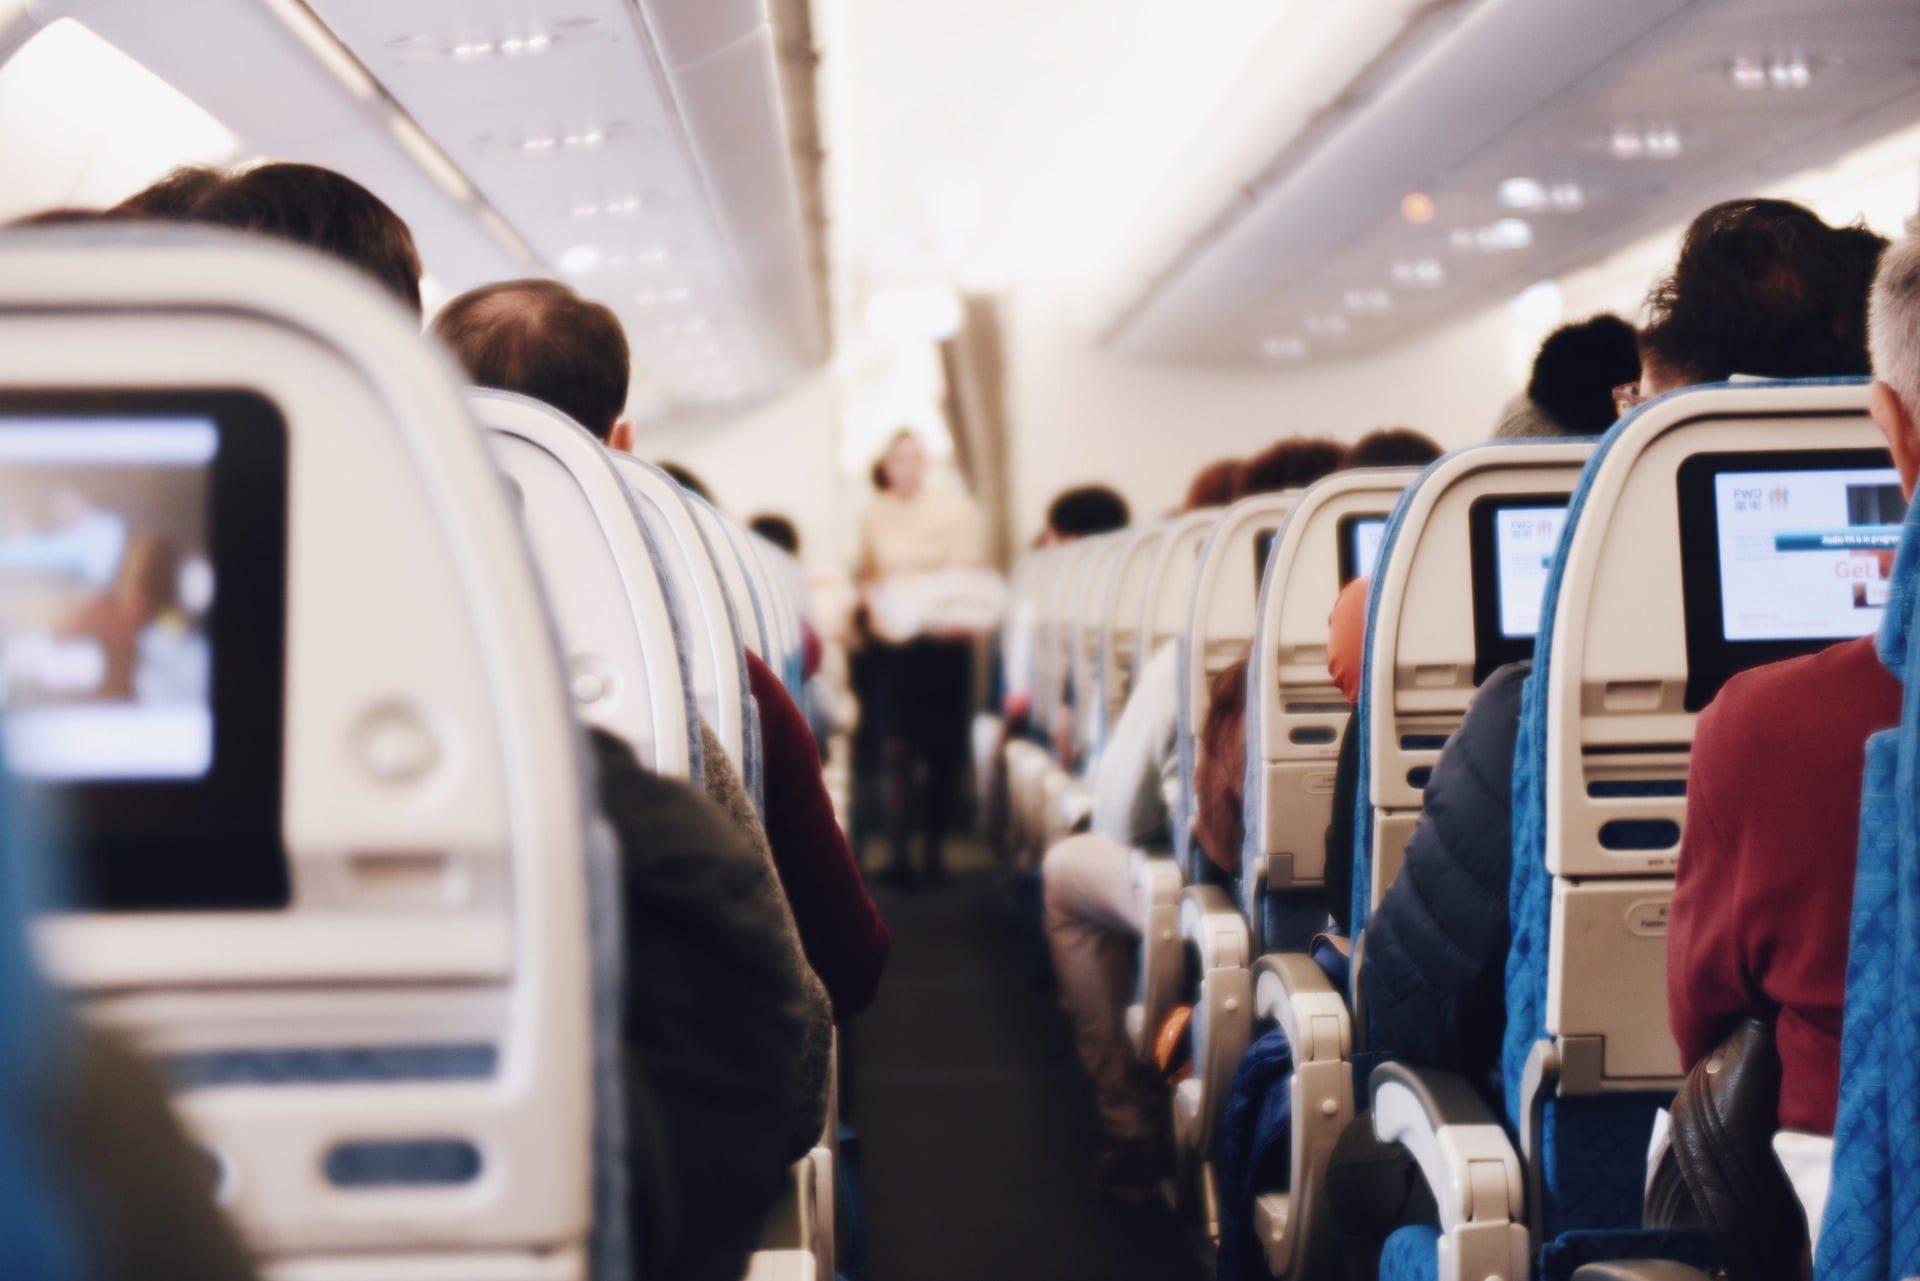 Packliste Handgepäck Langstreckenflug